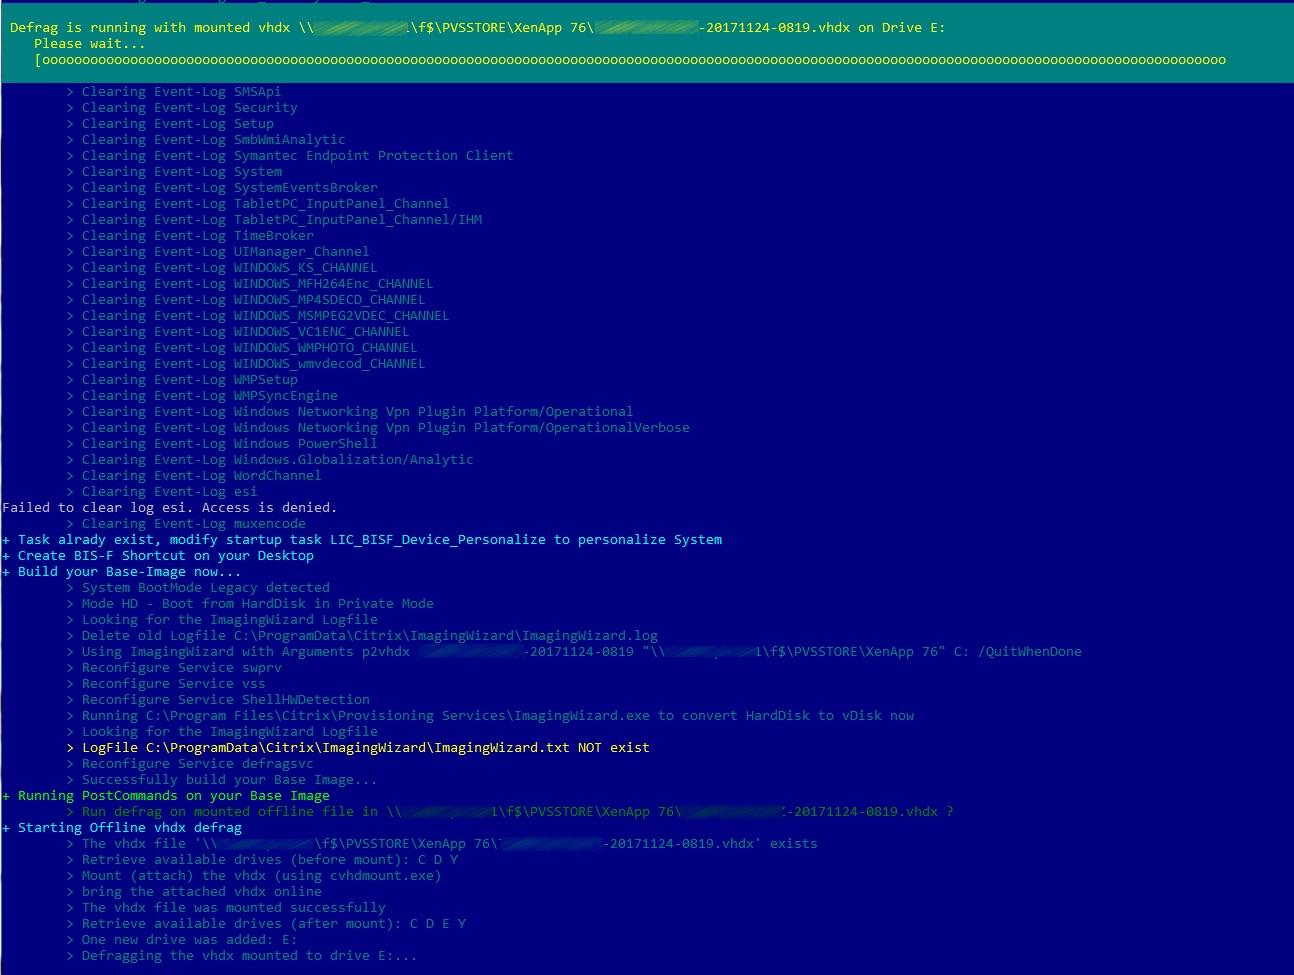 Offline Defragmentation - EUCweb com | focused on Citrix and